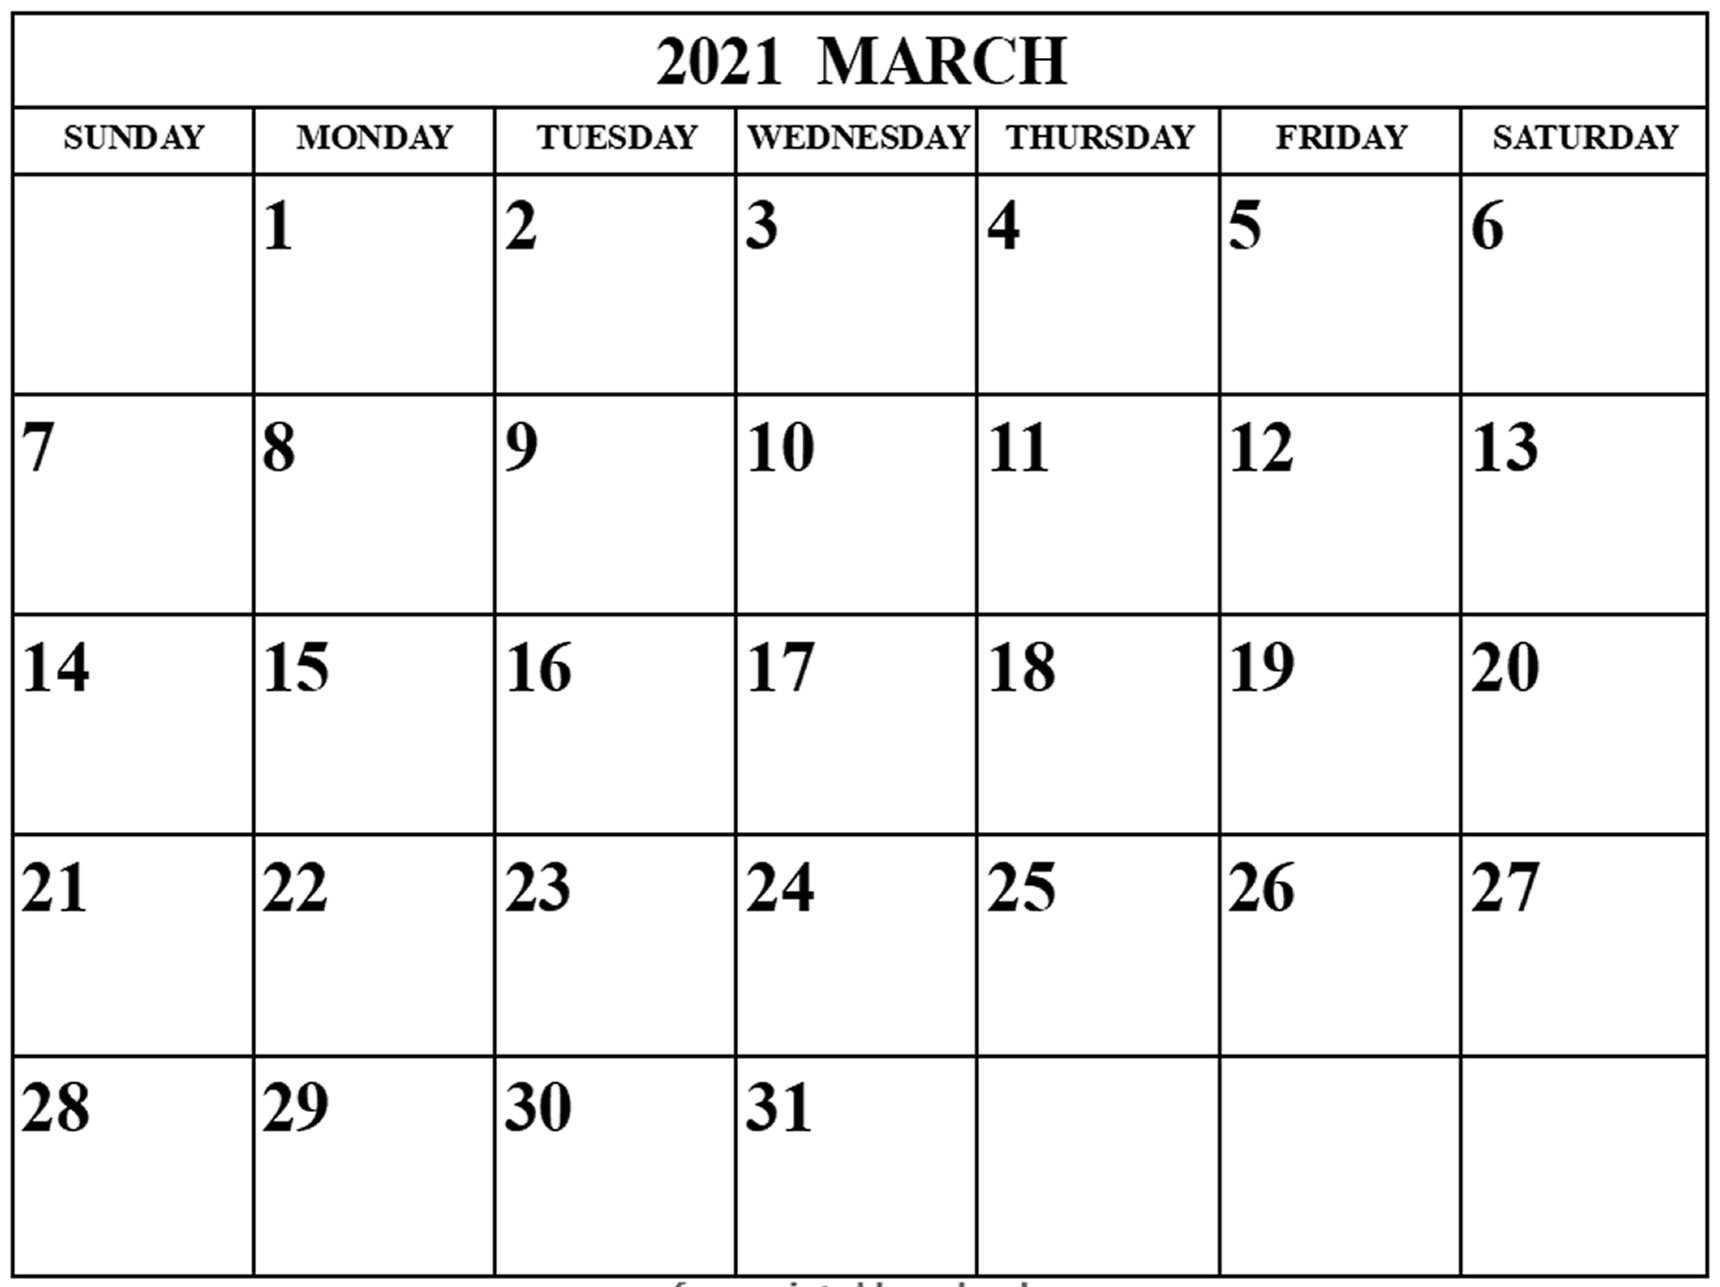 March 2021 Calendar Australia Holidays Template For Free - Web Galaxy Coder March 2021 Calendar throughout 2021 Calendar Template Excel Australia